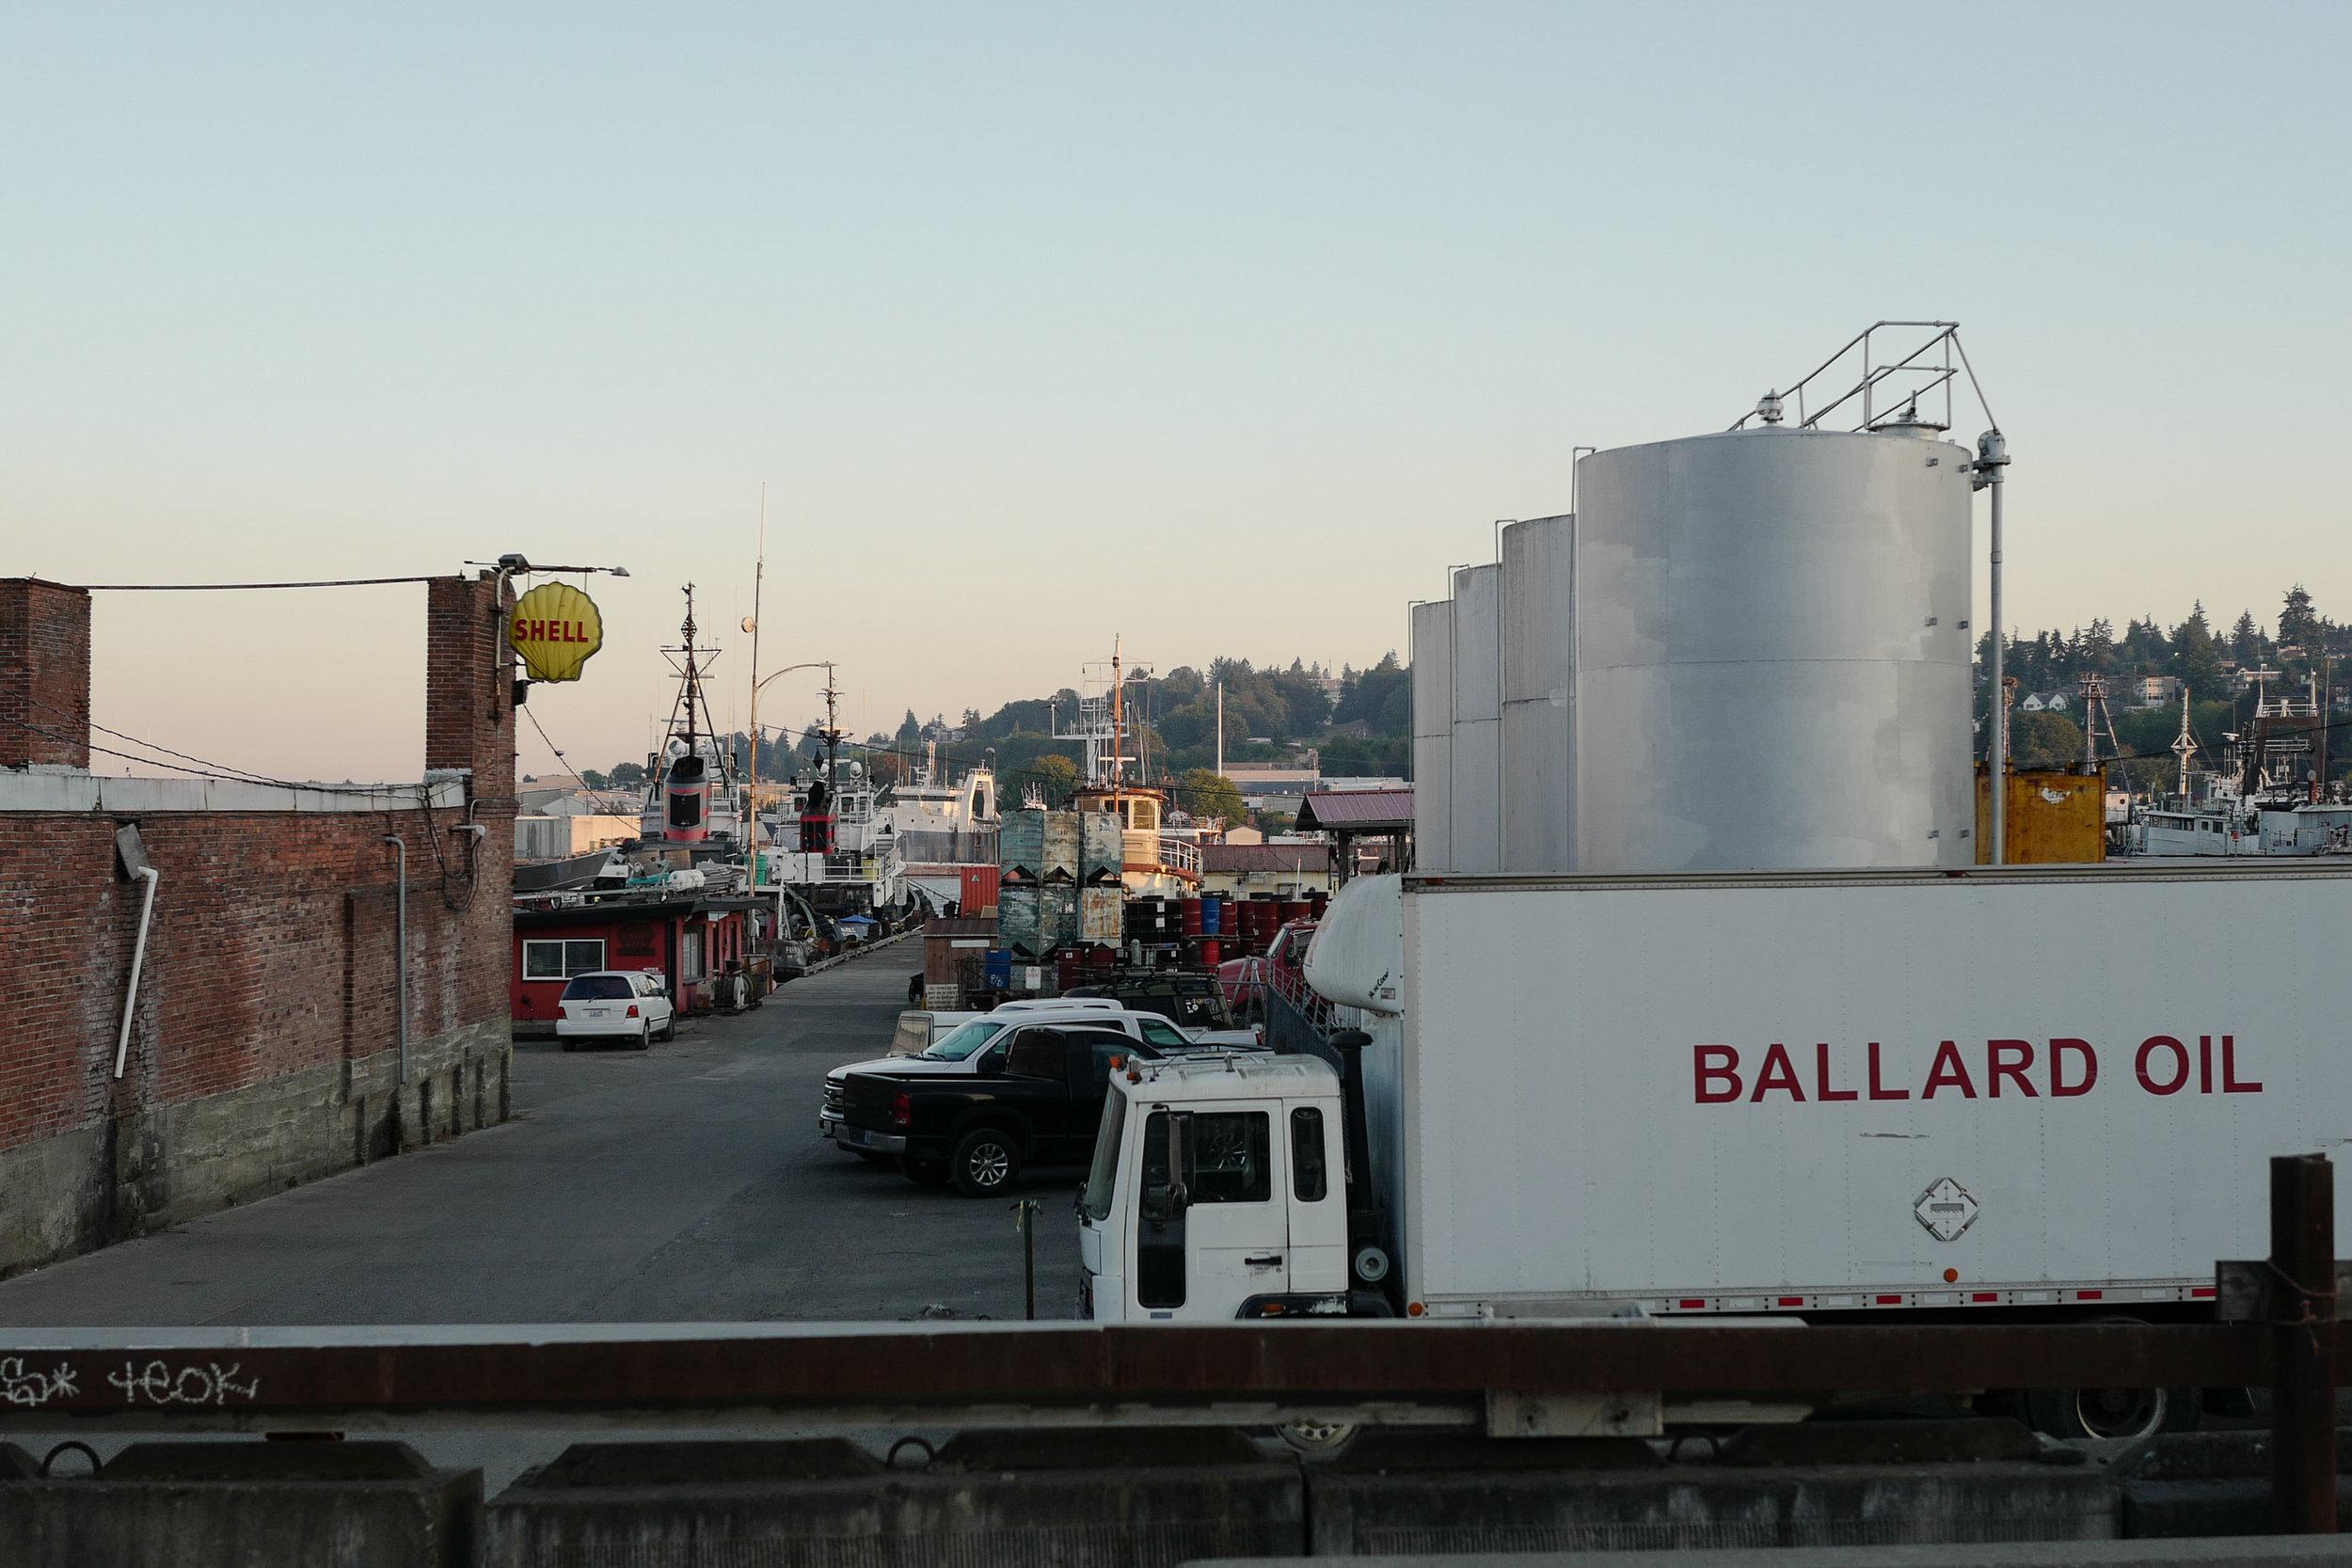 Ballard Oil truck